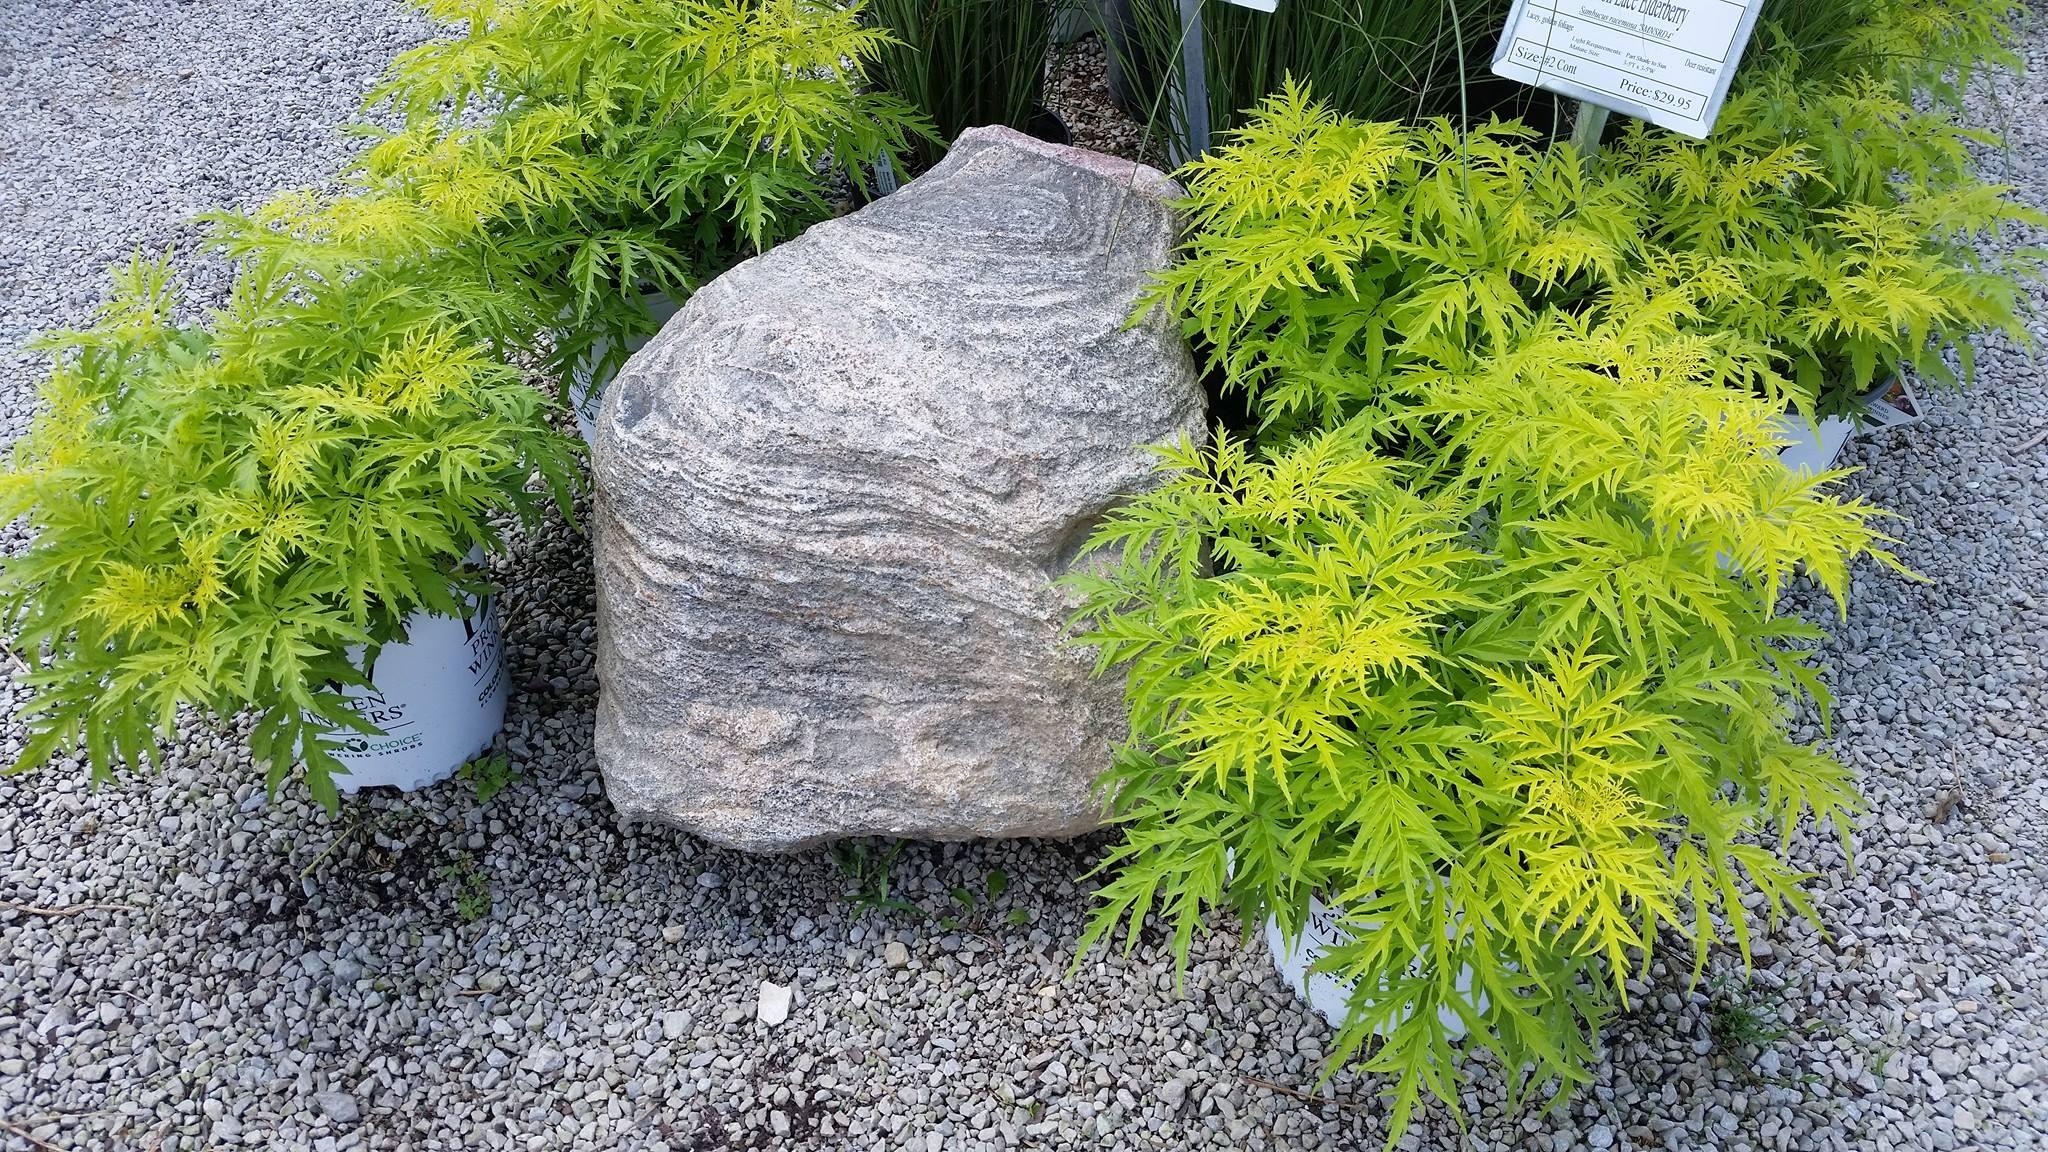 stones, rocks, boulders